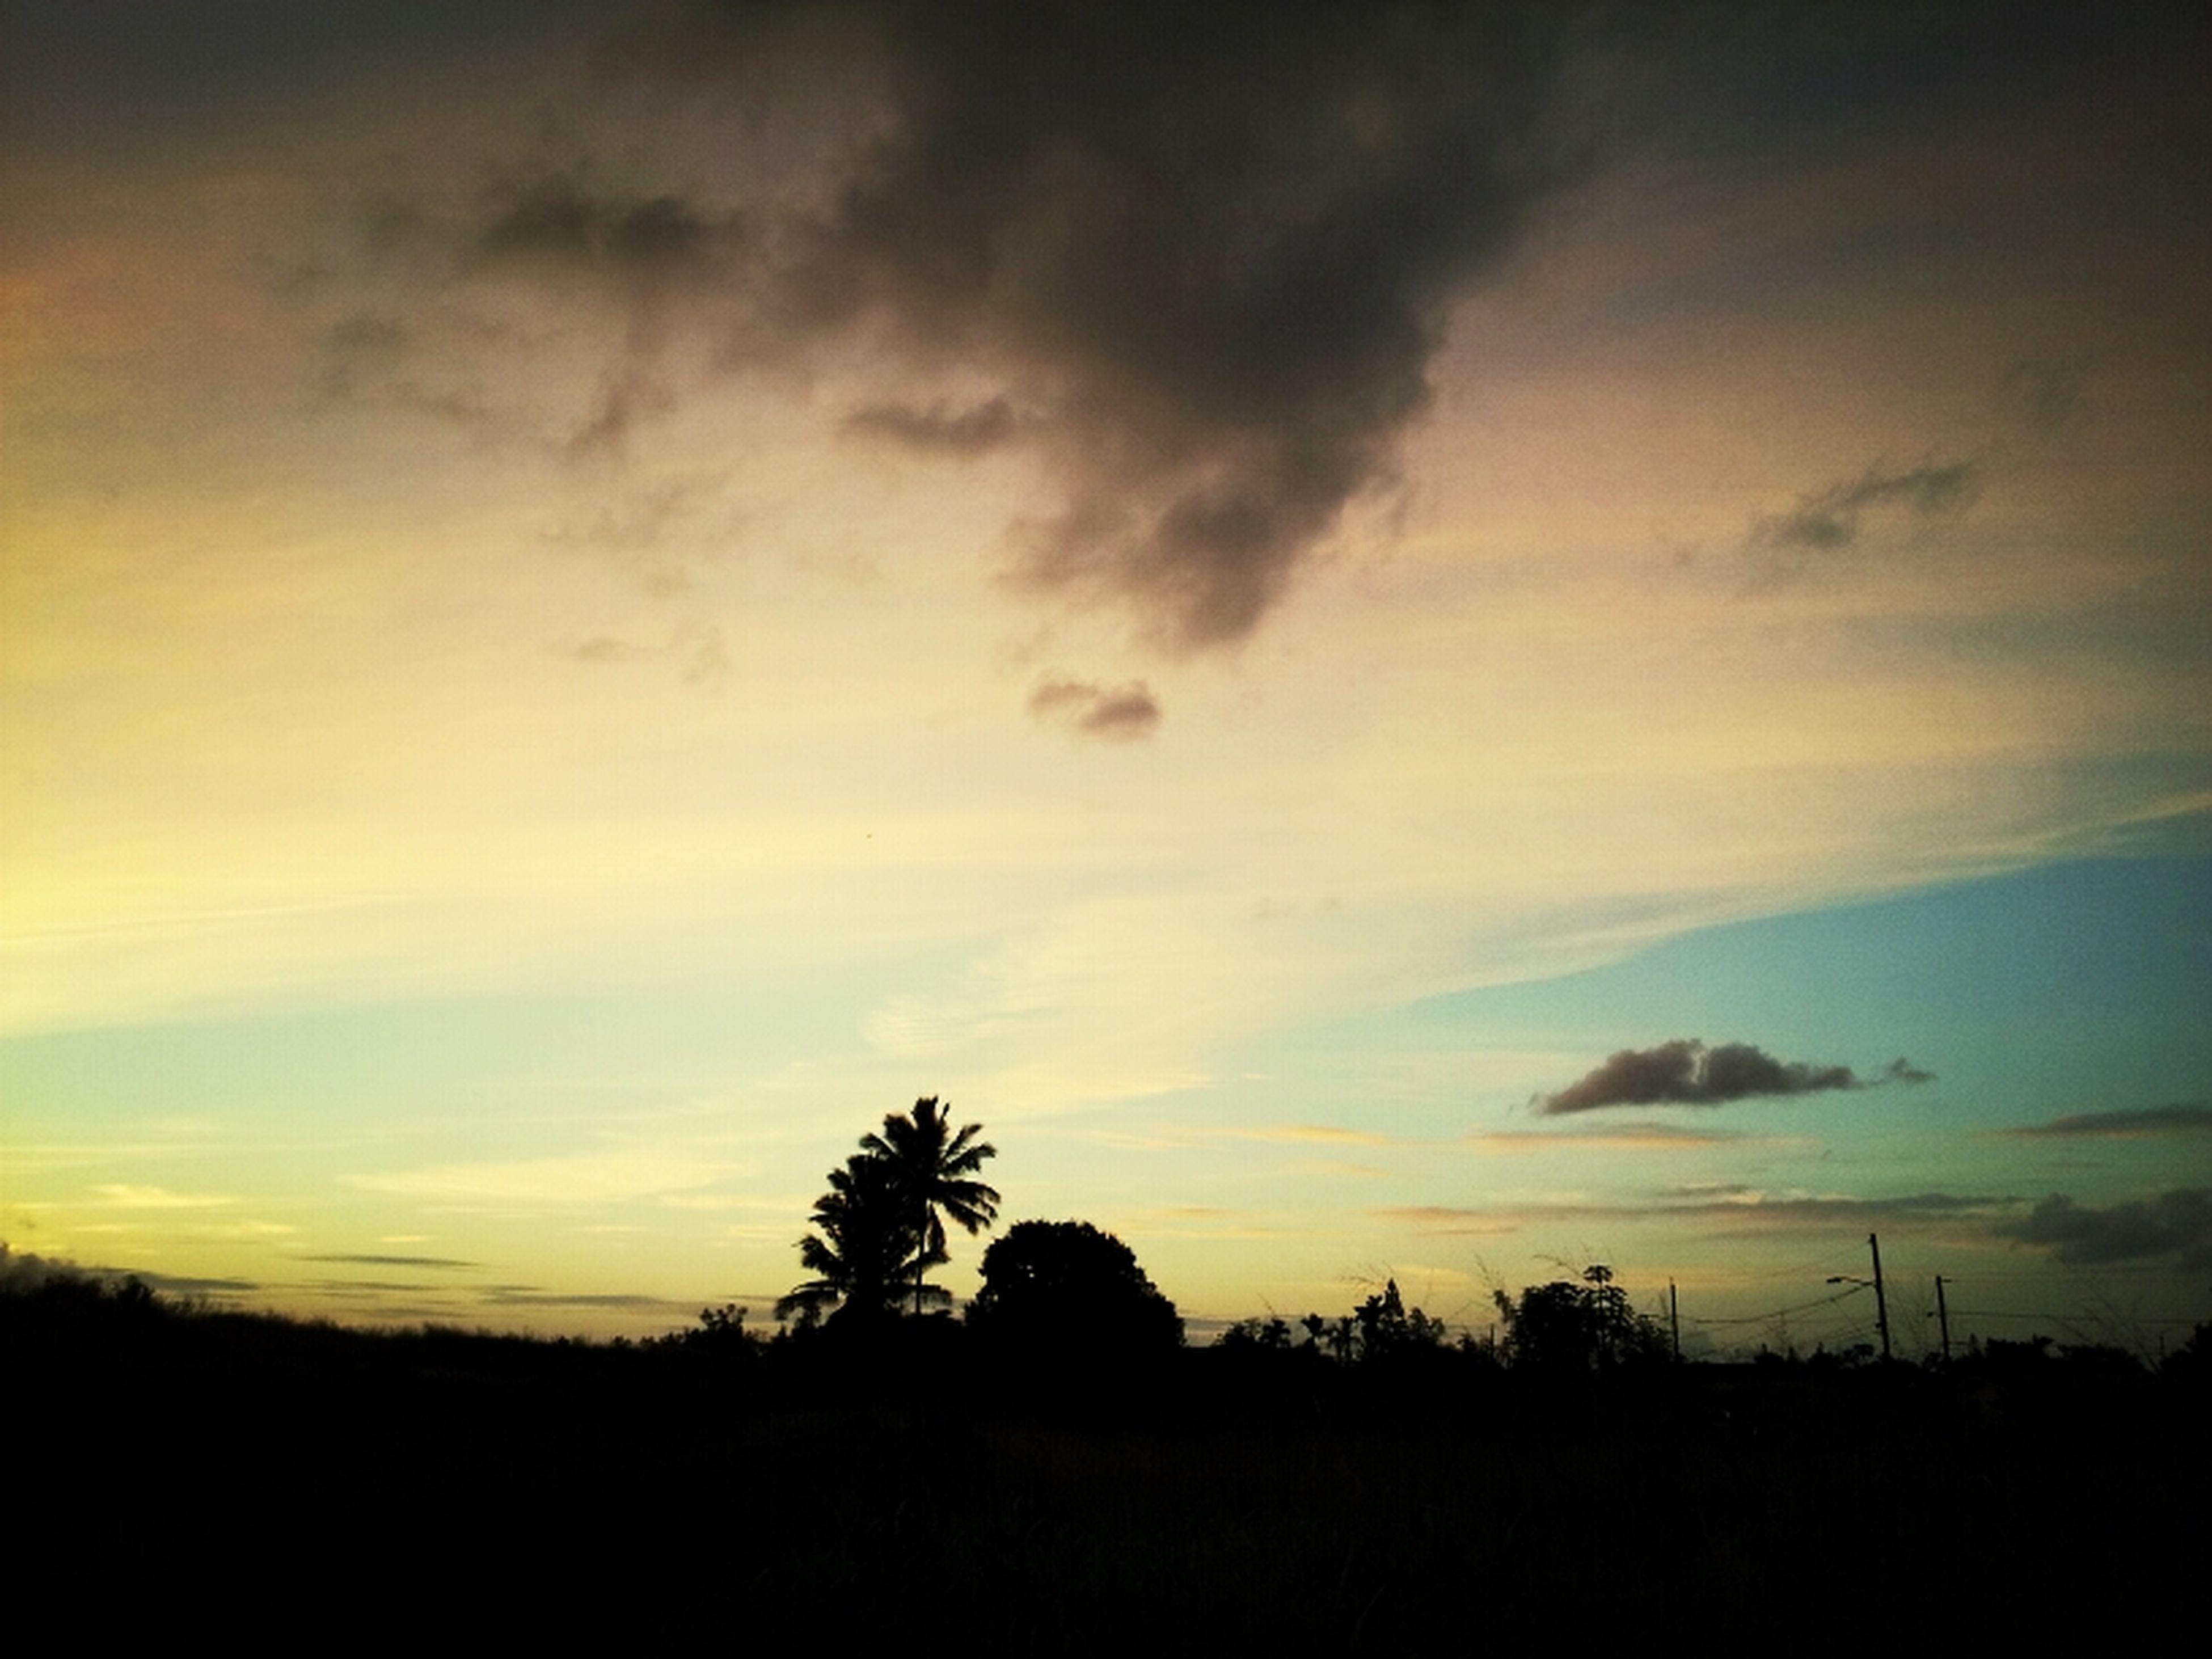 silhouette, sunset, tranquil scene, tranquility, sky, scenics, landscape, beauty in nature, nature, tree, field, idyllic, cloud - sky, dark, cloud, outdoors, dusk, non-urban scene, outline, orange color